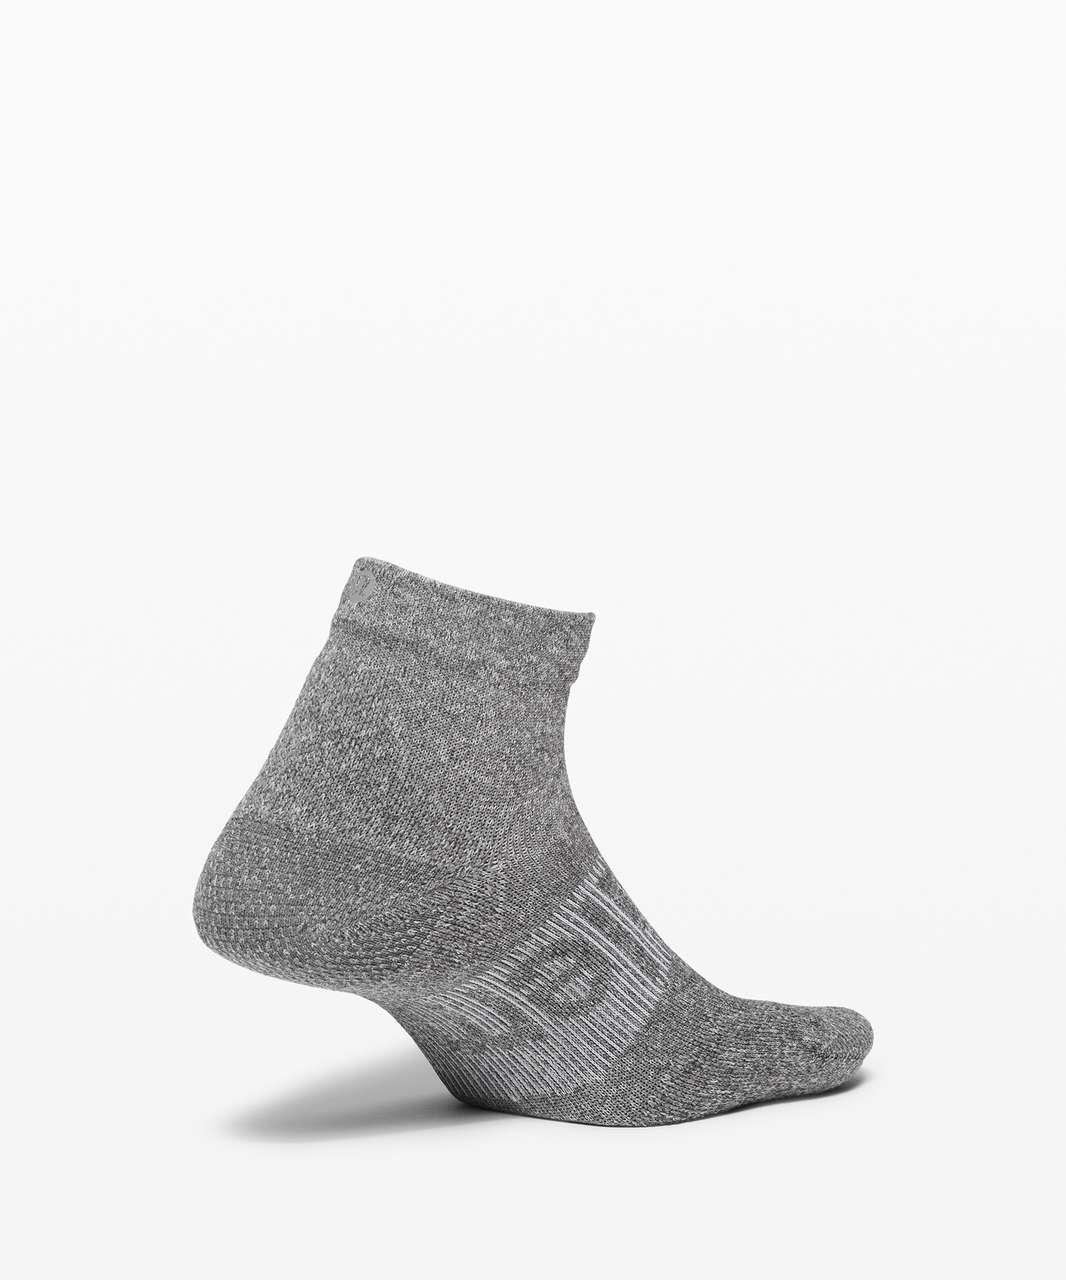 Lululemon Power Stride Ankle Sock - Heathered Graphite Grey